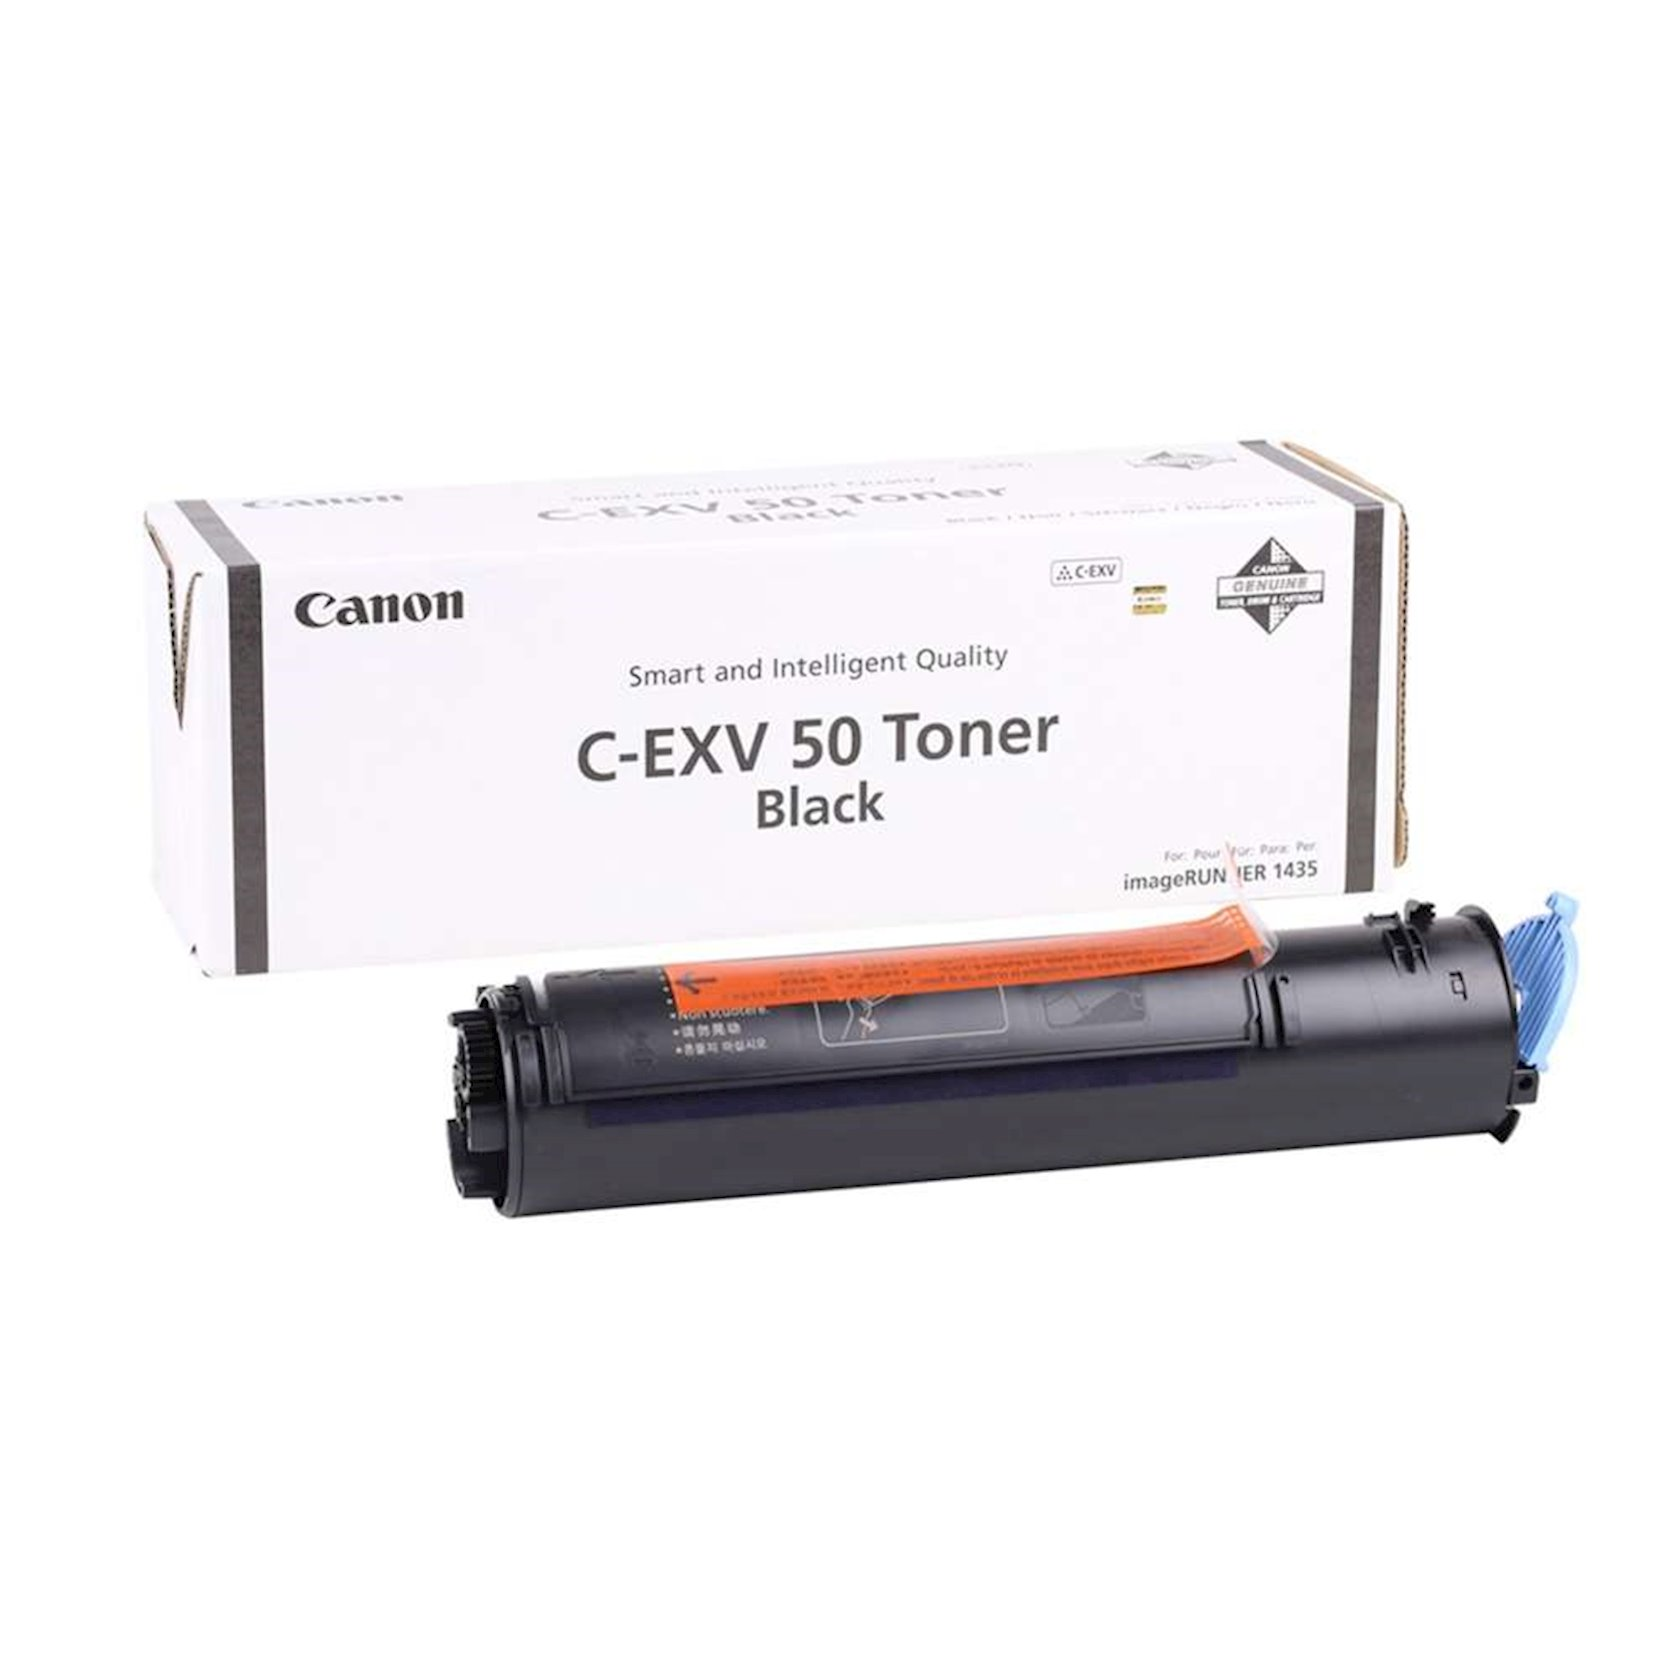 Toner-kartric Canon C-EXV50 Black